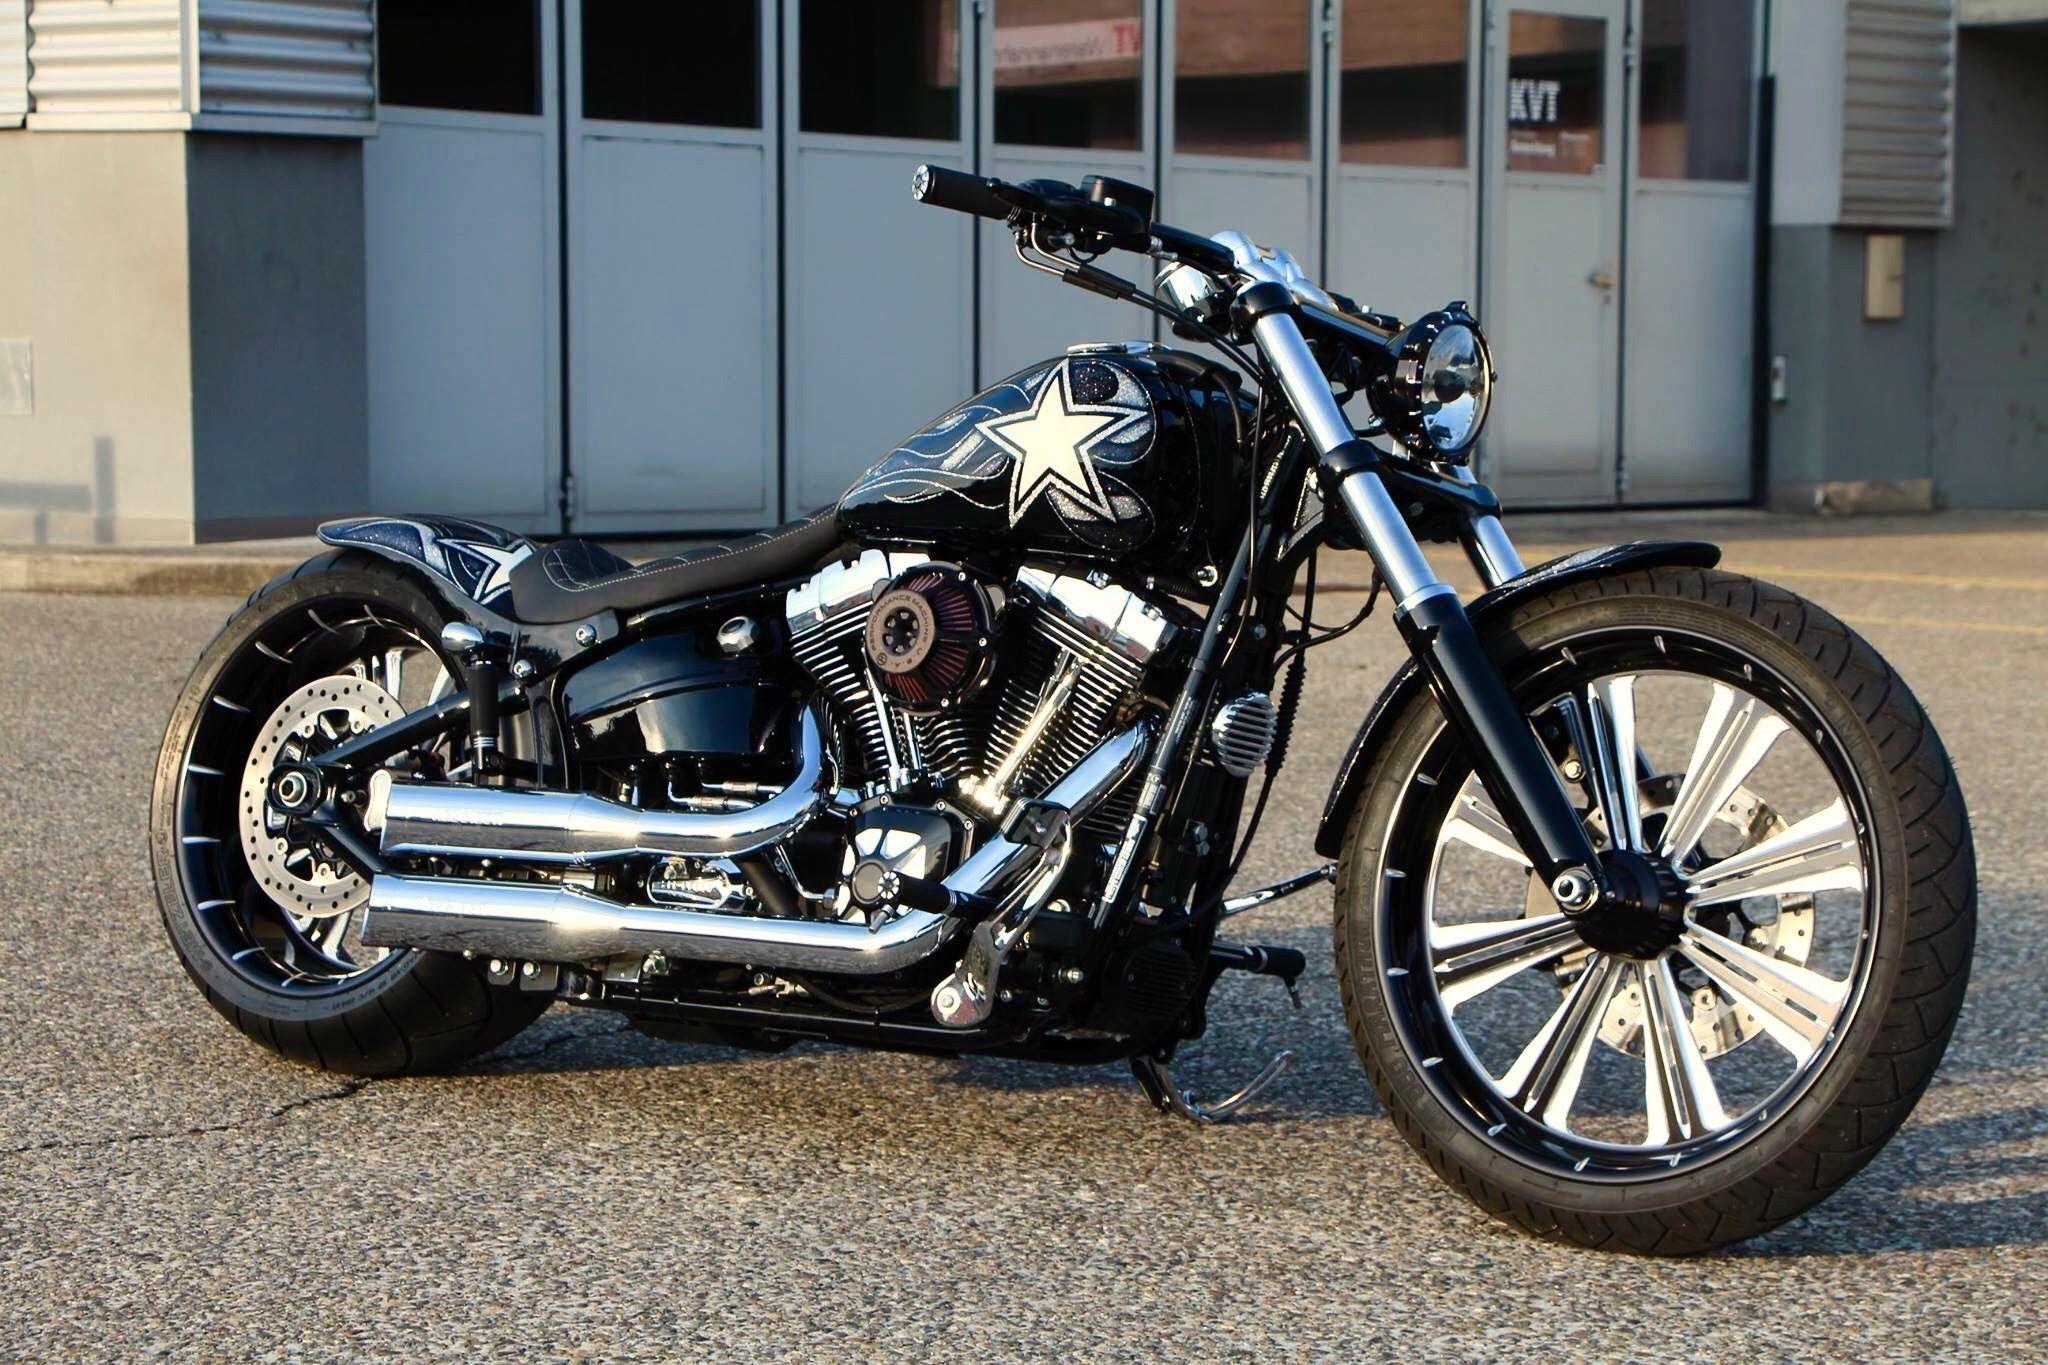 WildBunchIndustries Harley Davidson Shovelhead Custom Bike